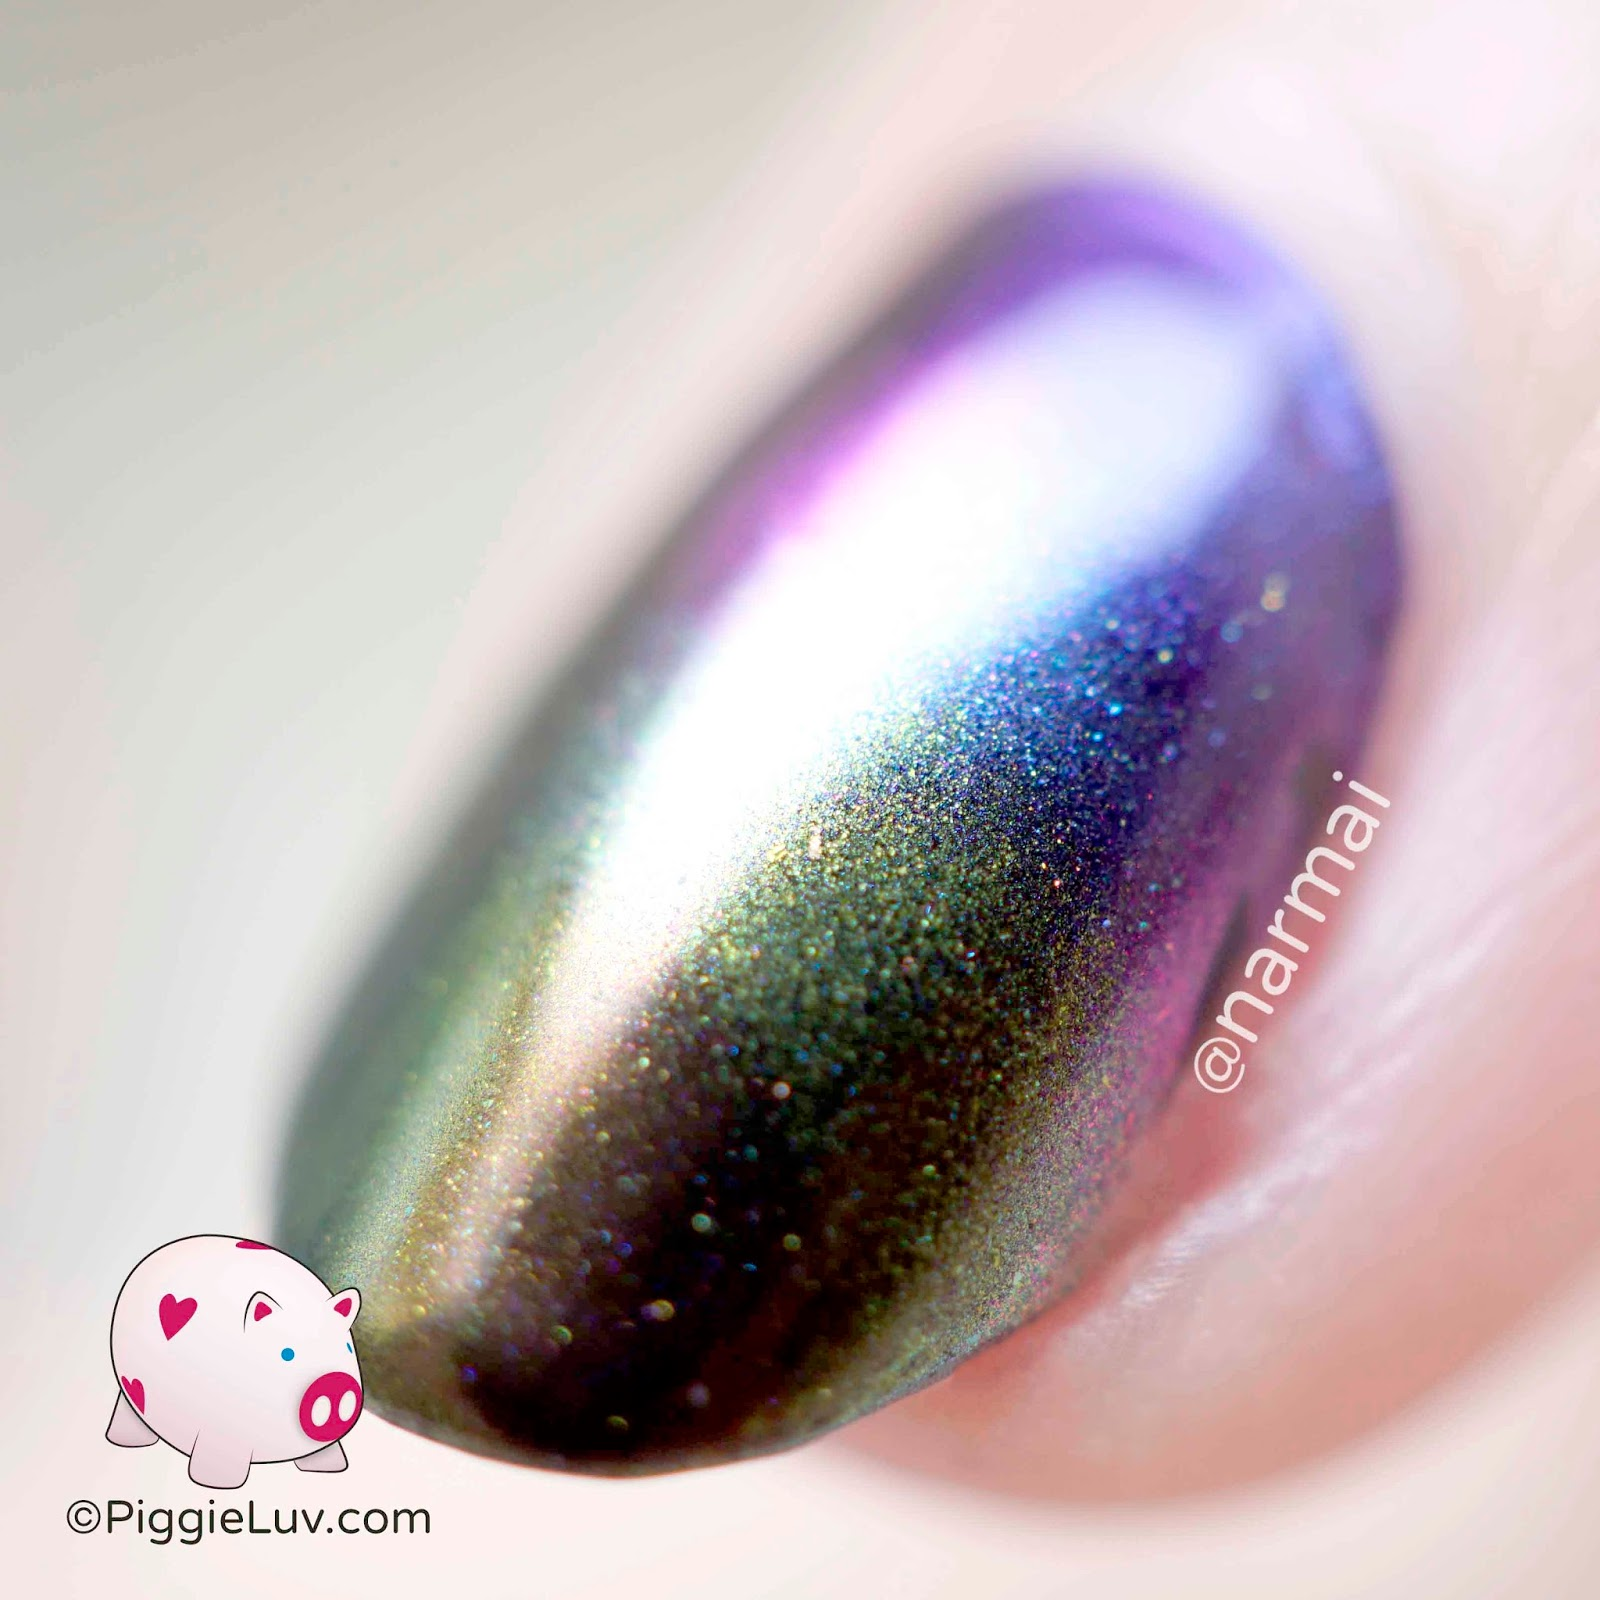 Piggieluv Rainbow Bubbles Nail Art: PiggieLuv: Rainbow Gasoline Nail Art With Magic Shifting